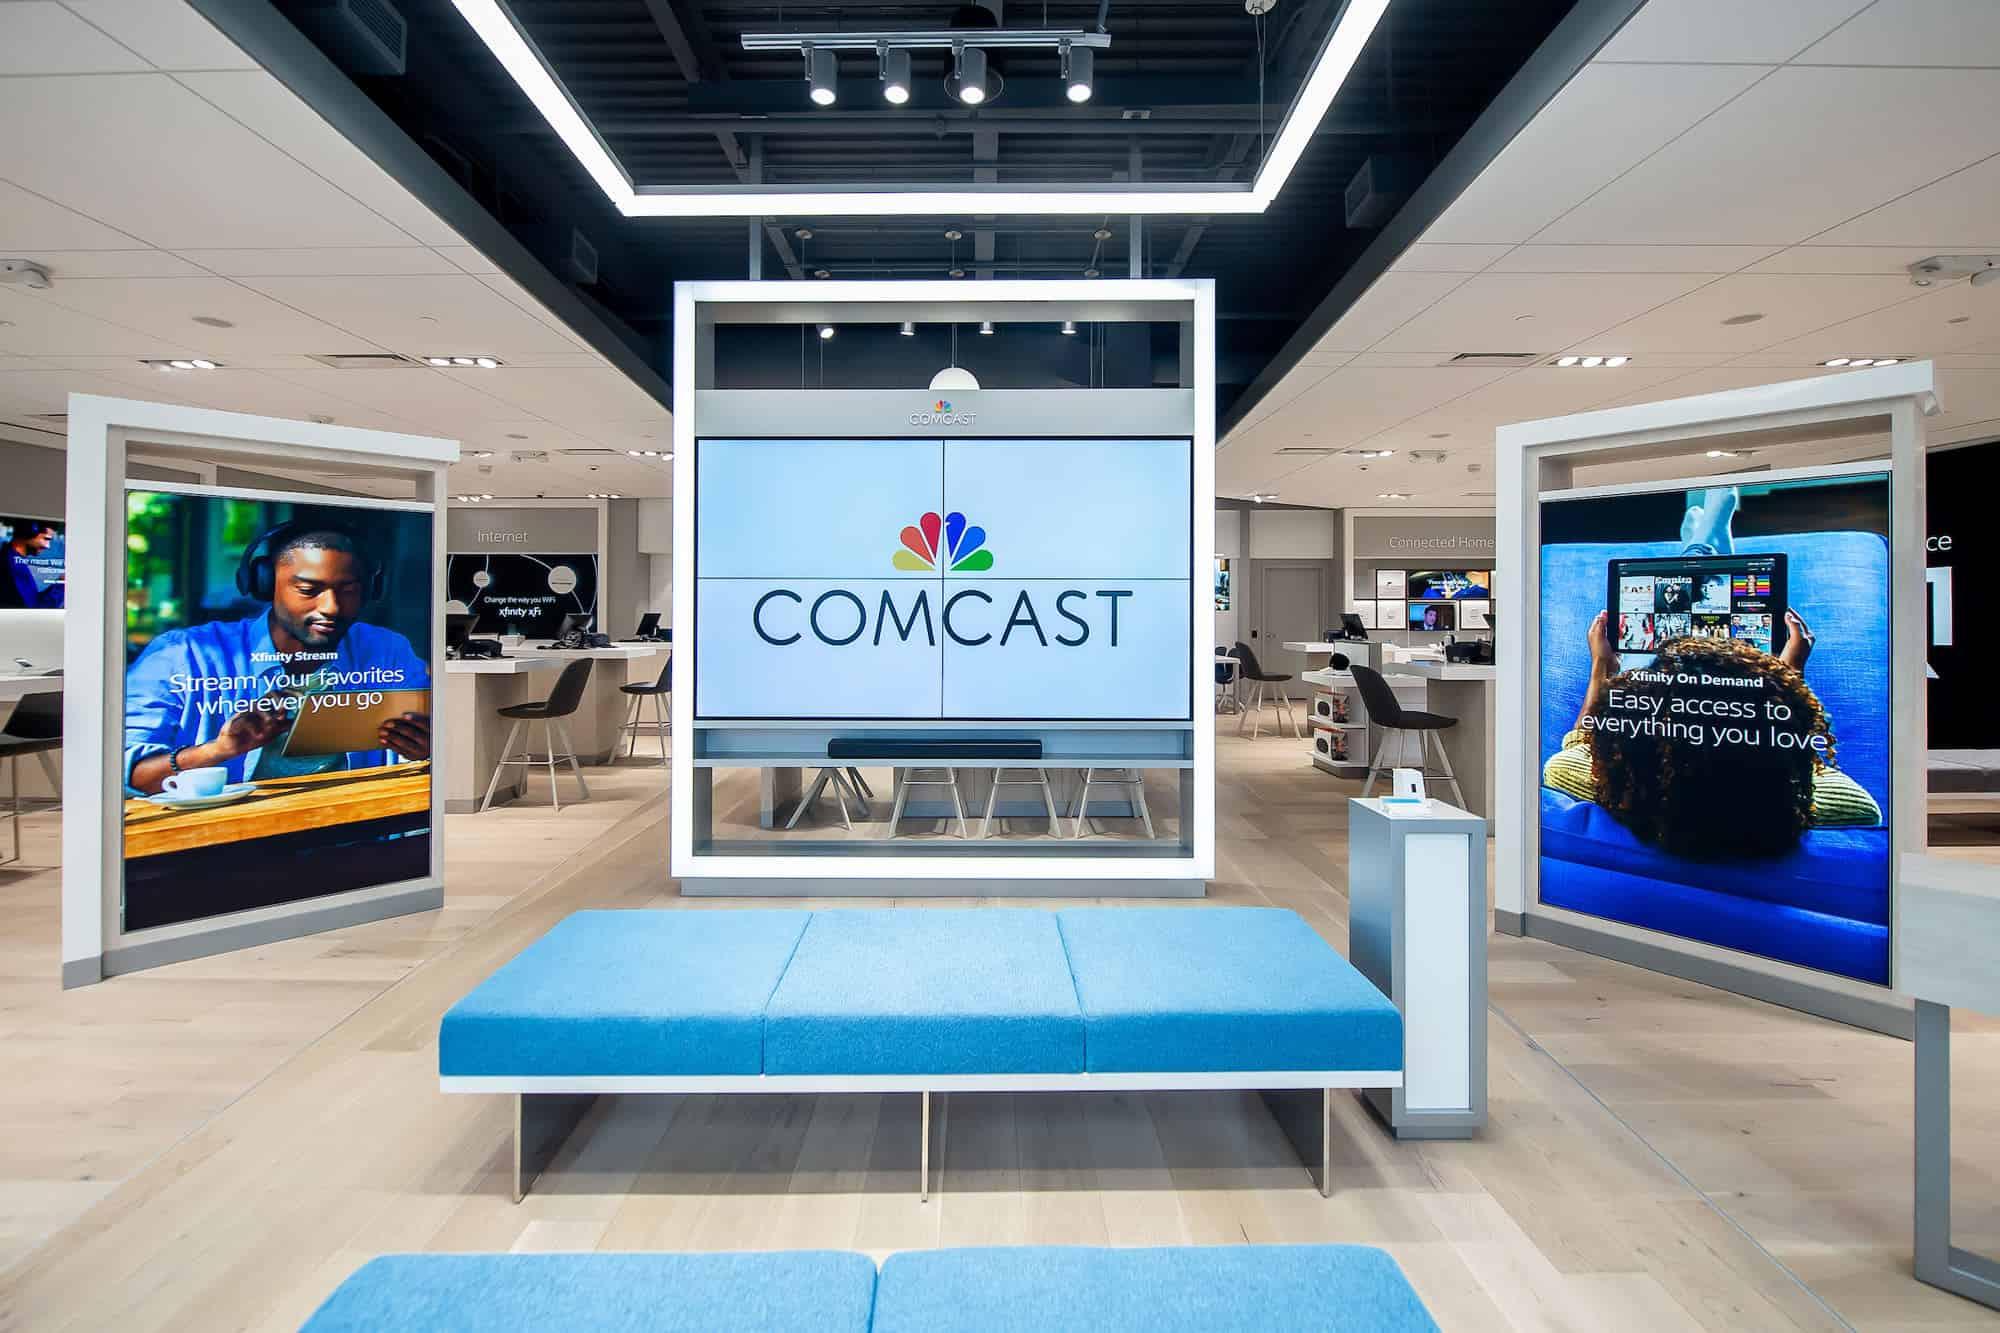 comcast-internet-deals-for-19-99-for-6-months